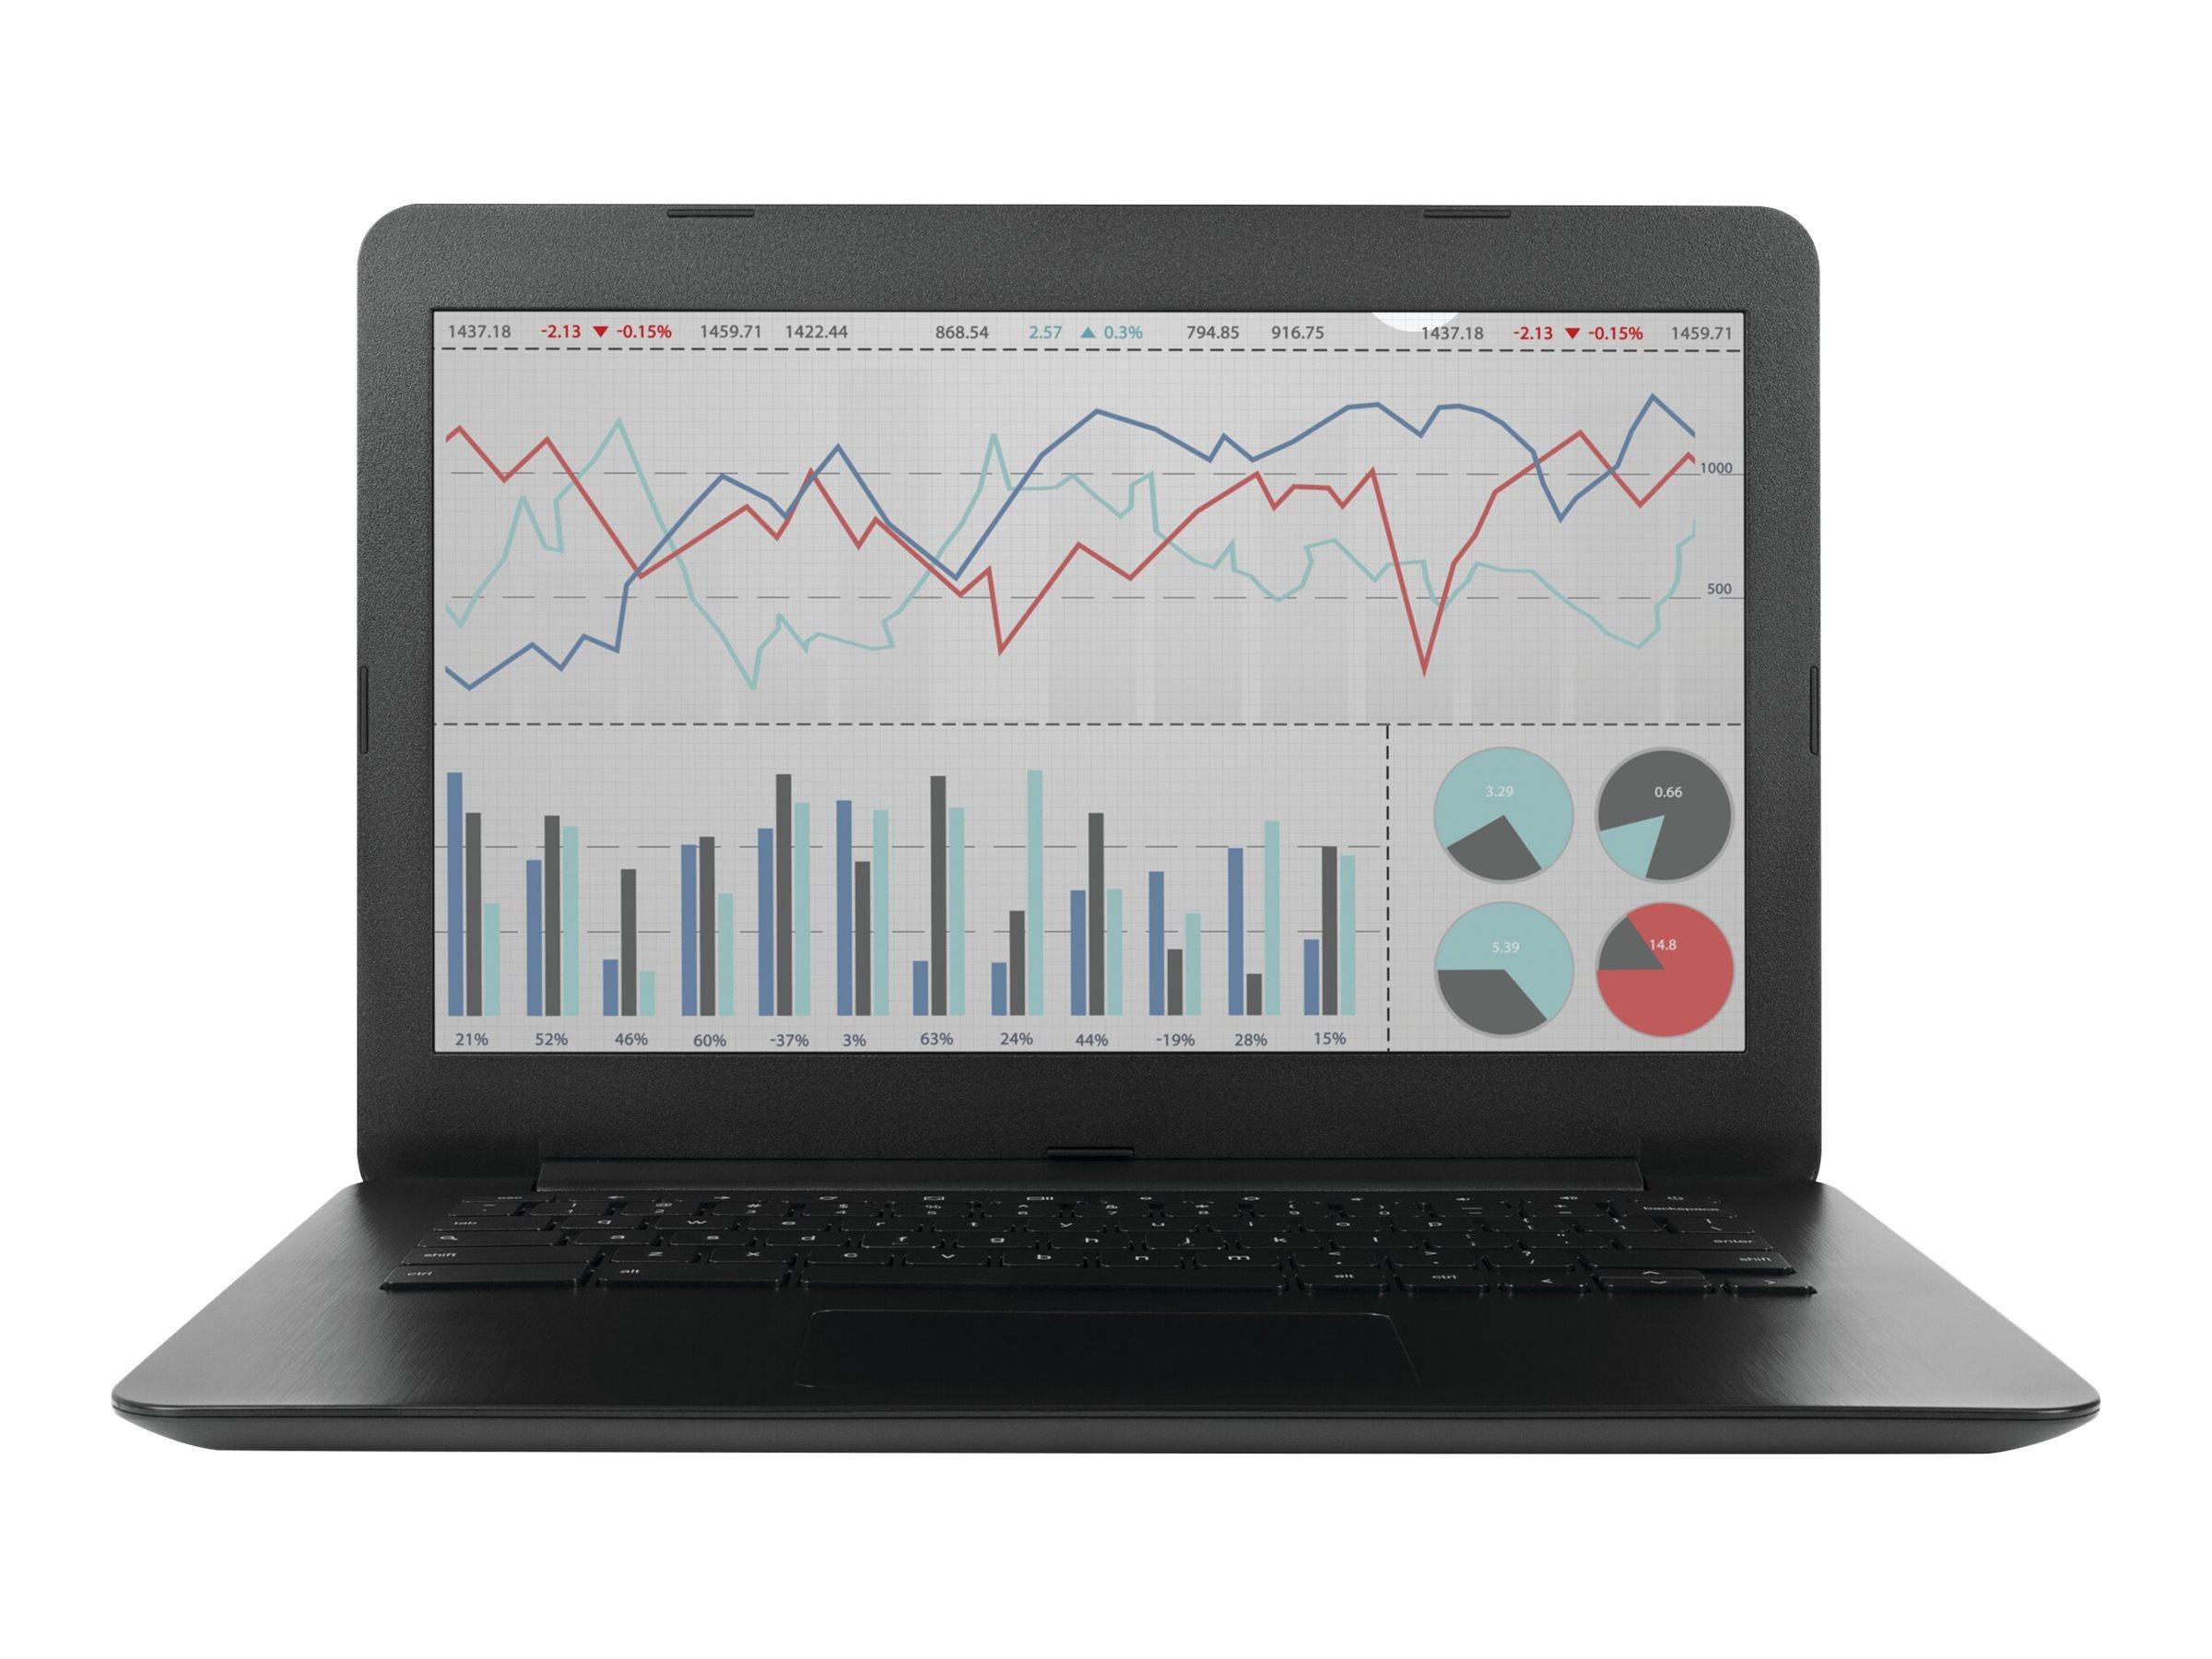 Kensington FP154W10 Privacy Screen for Laptops (15.4